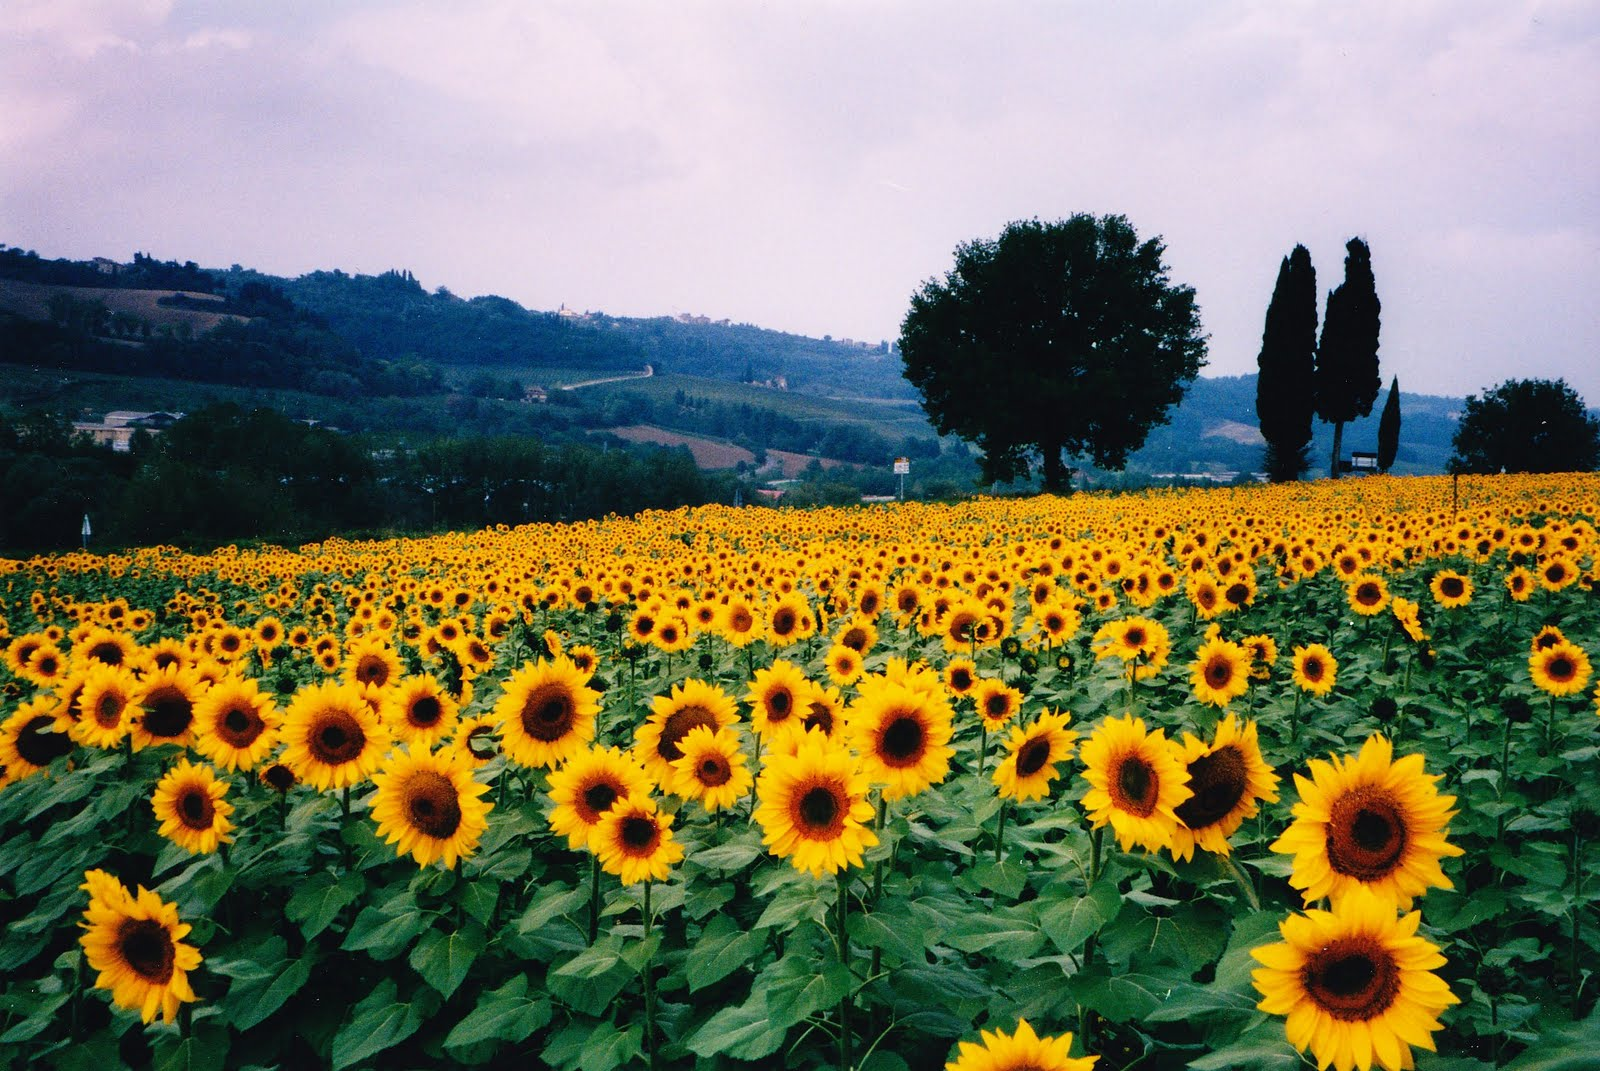 Chèvrefeuille s haiku blog Sunflower